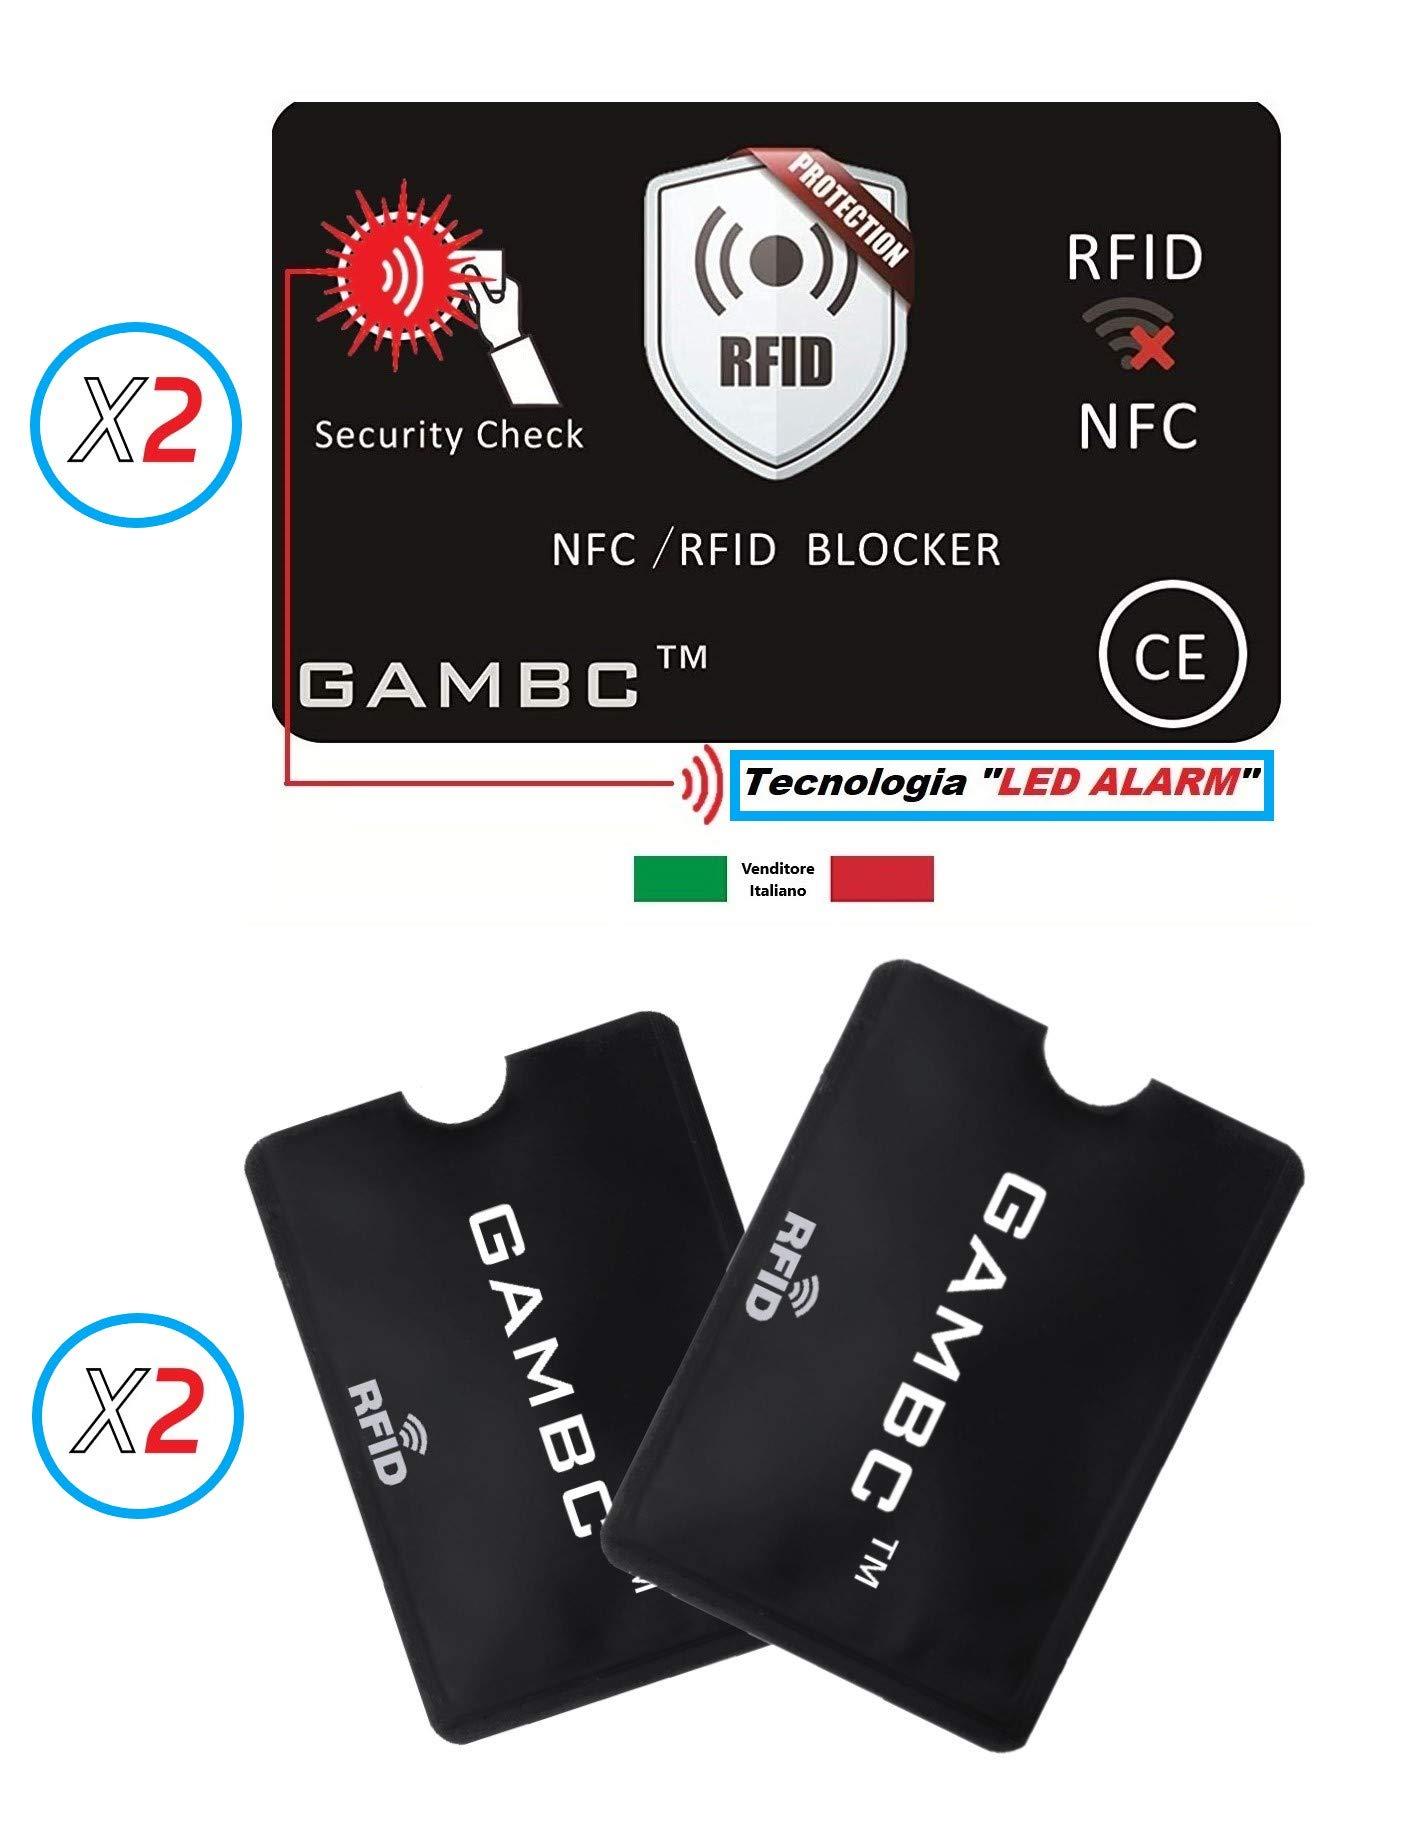 b72389efdd 4 PZ ✅ 2 Carte Protezione Rfid con LED + 2 Custodie Blocco RFID/NFC